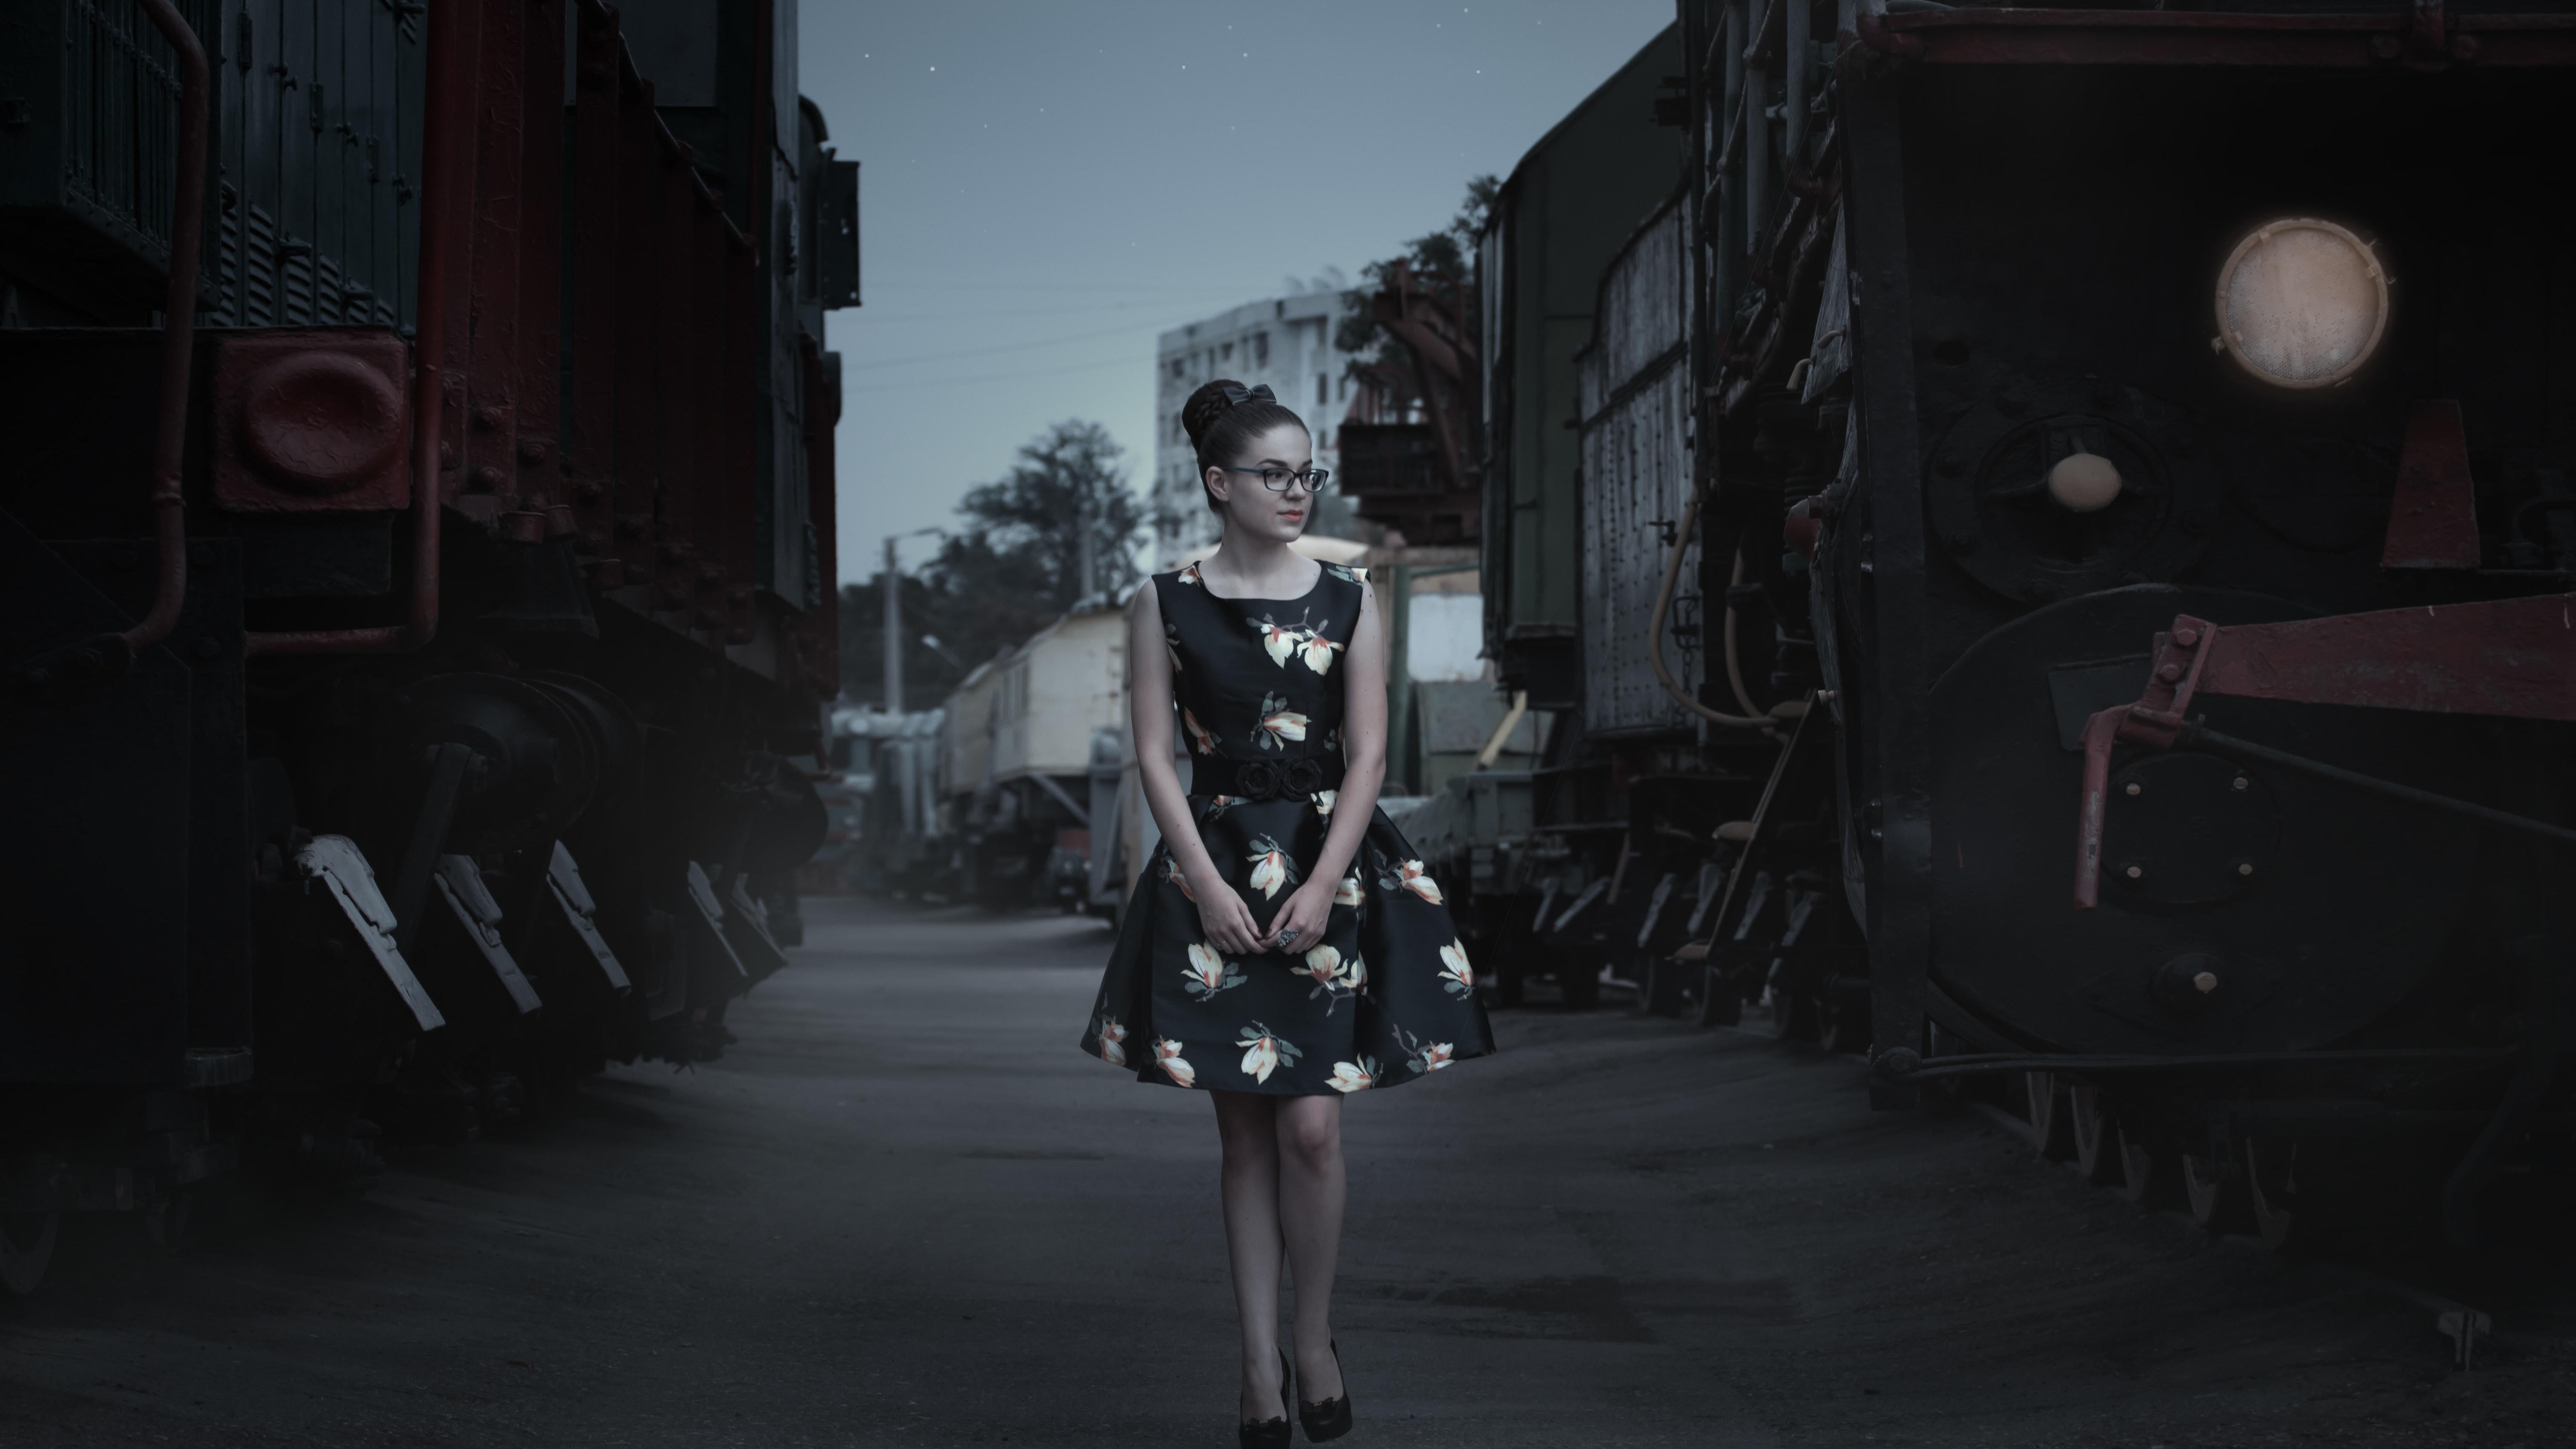 Woman in City at Night, Beautiful, Dress, Fashion, Female, HQ Photo